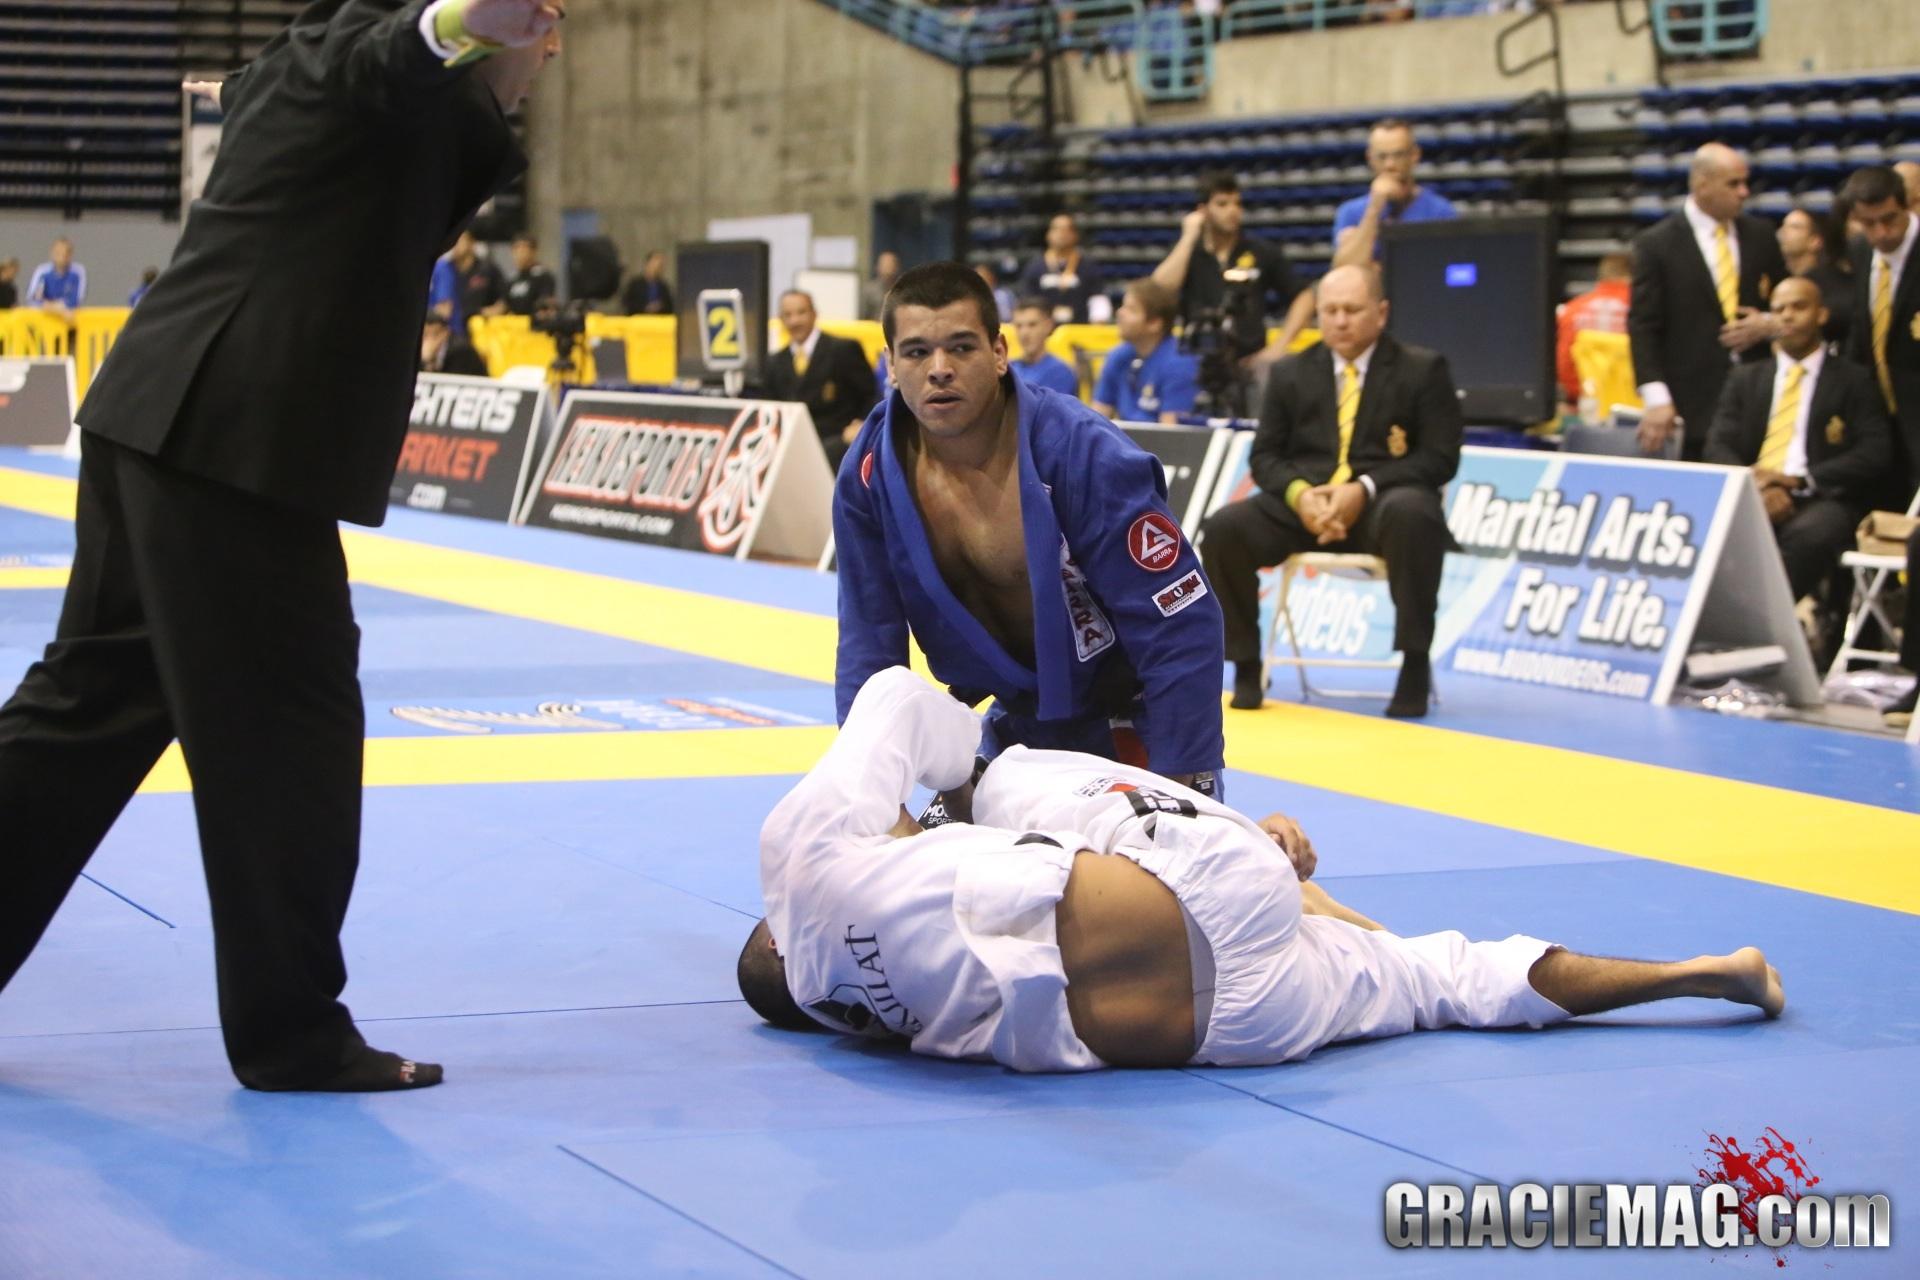 Roberto Alencar vs. Nivaldo Lima